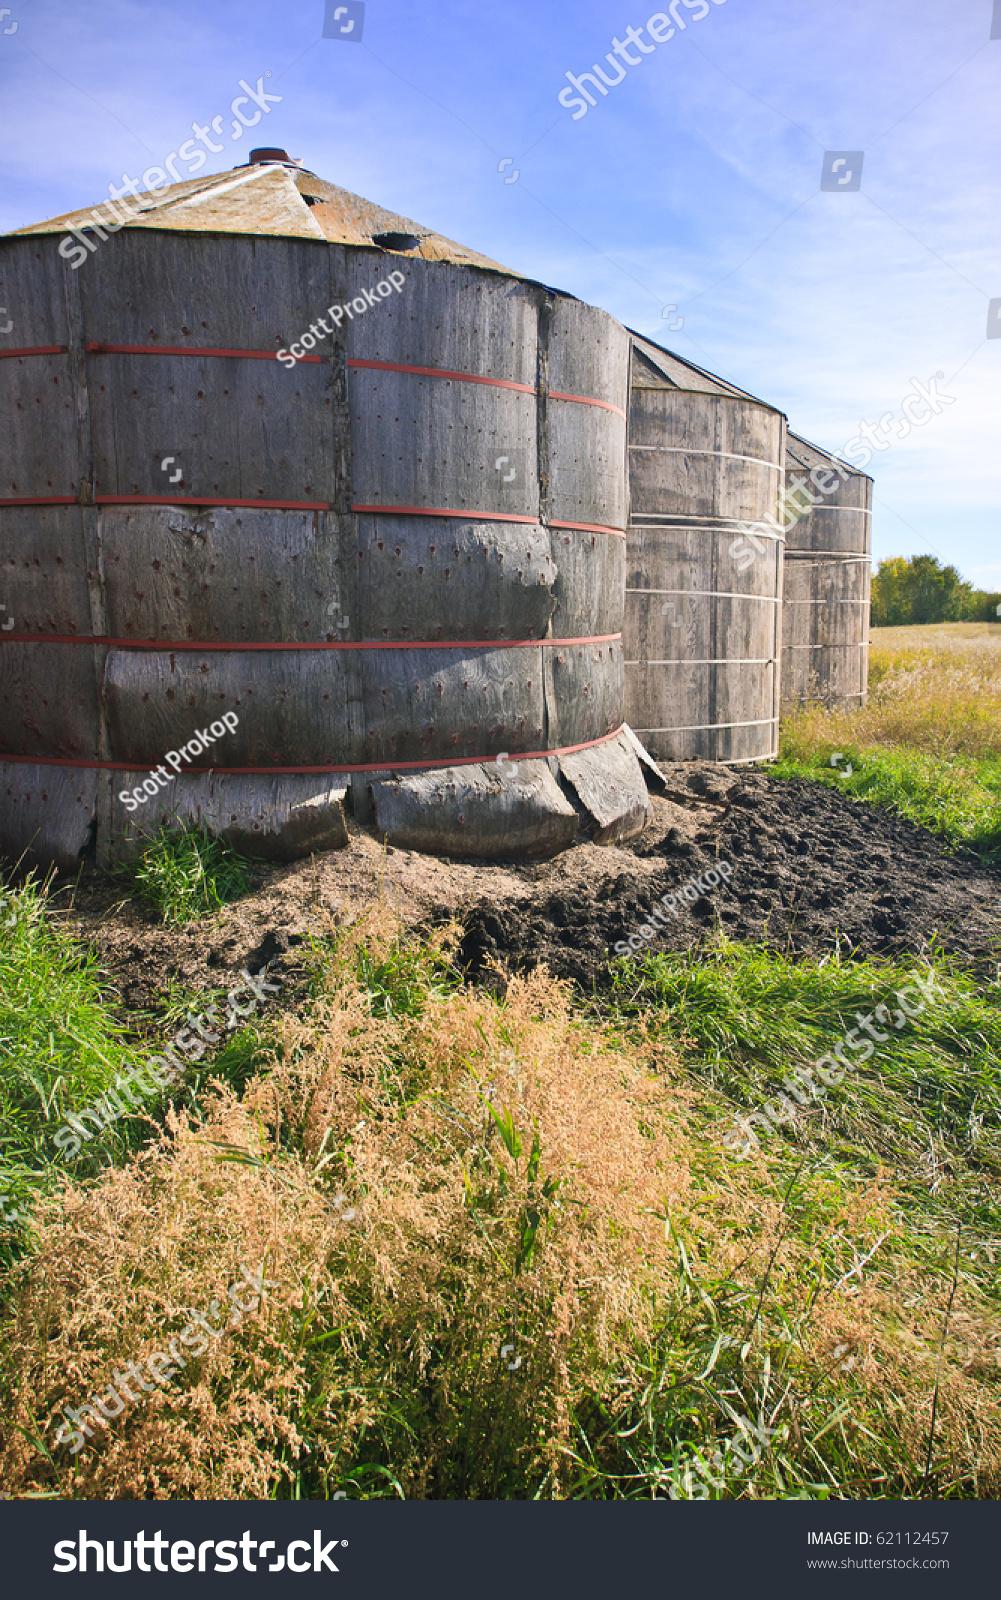 Wood Grain Storage : Old wood grain storage bins on the prairies stock photo